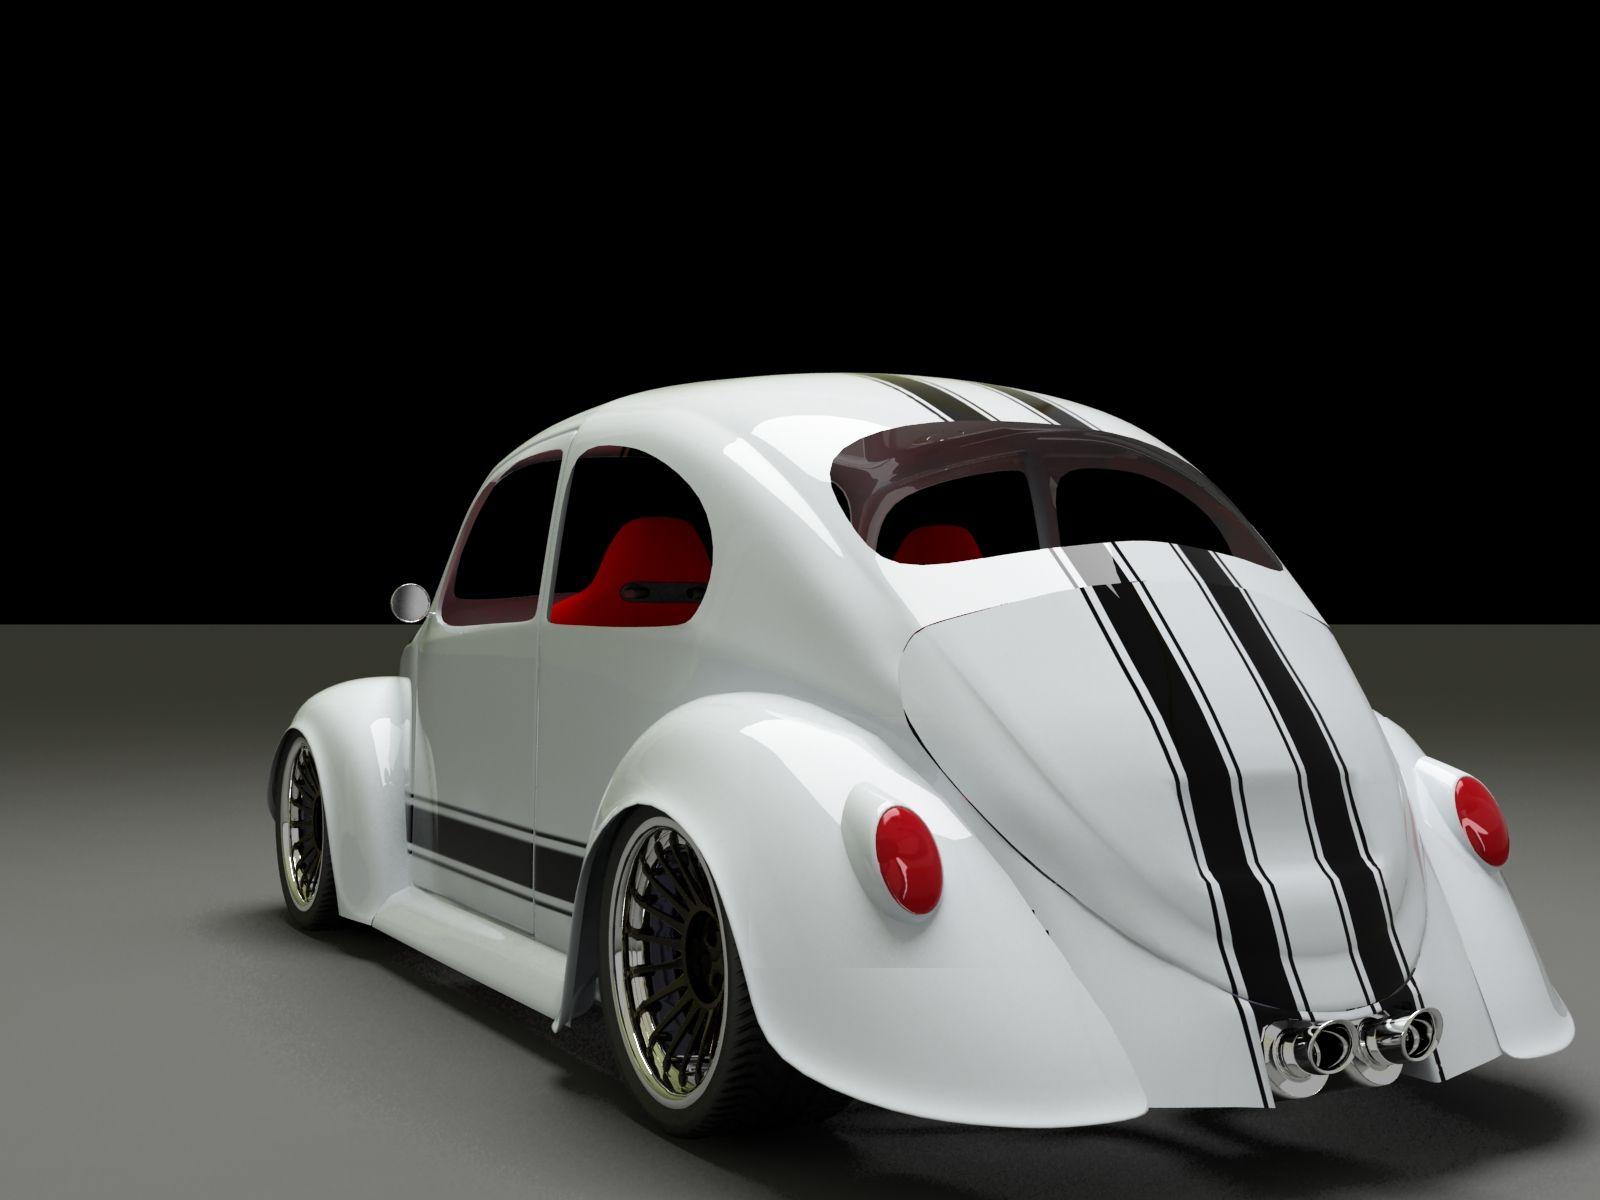 Tiny house bugs car pictures car tuning - Custom Vw Bug 69 Custom Beetle Vw Beetle Rear01 Jpg Cool Carsvw